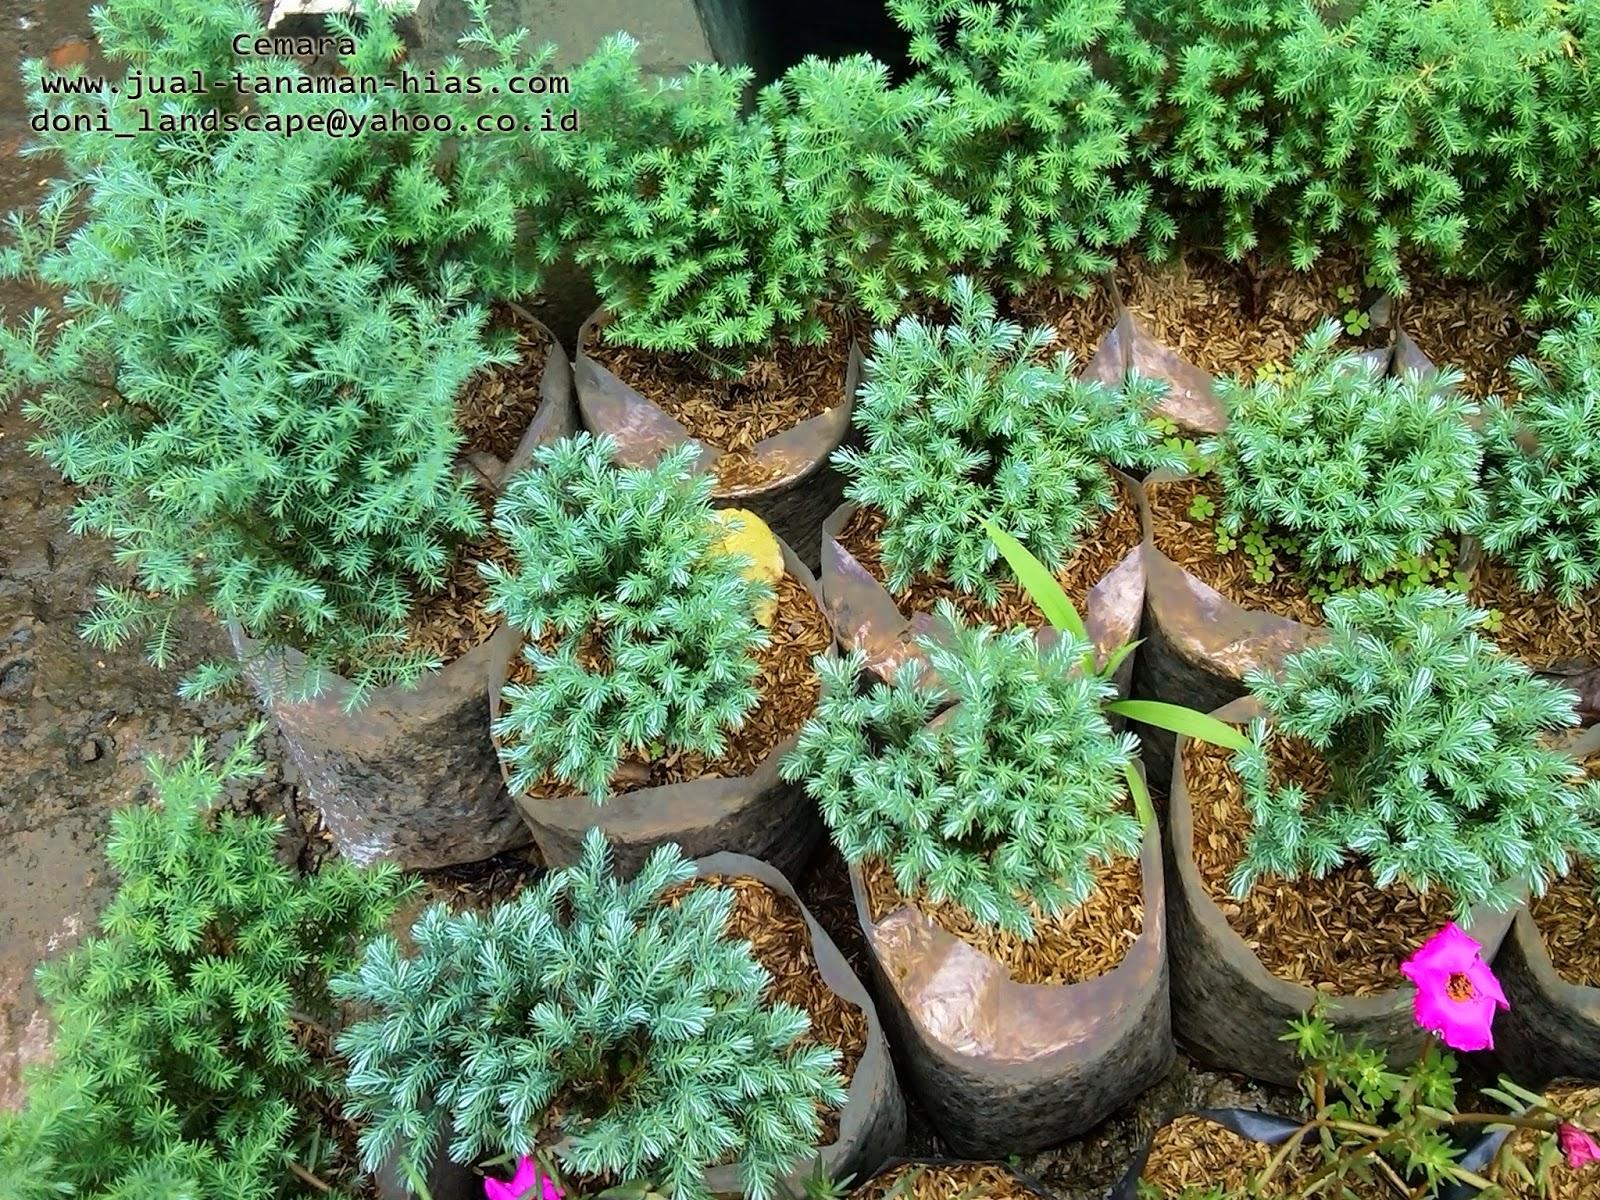 Jasa Pembuatan Taman, Supler tanaman Hias, Tukang Taman Modern, Tukang Kolam